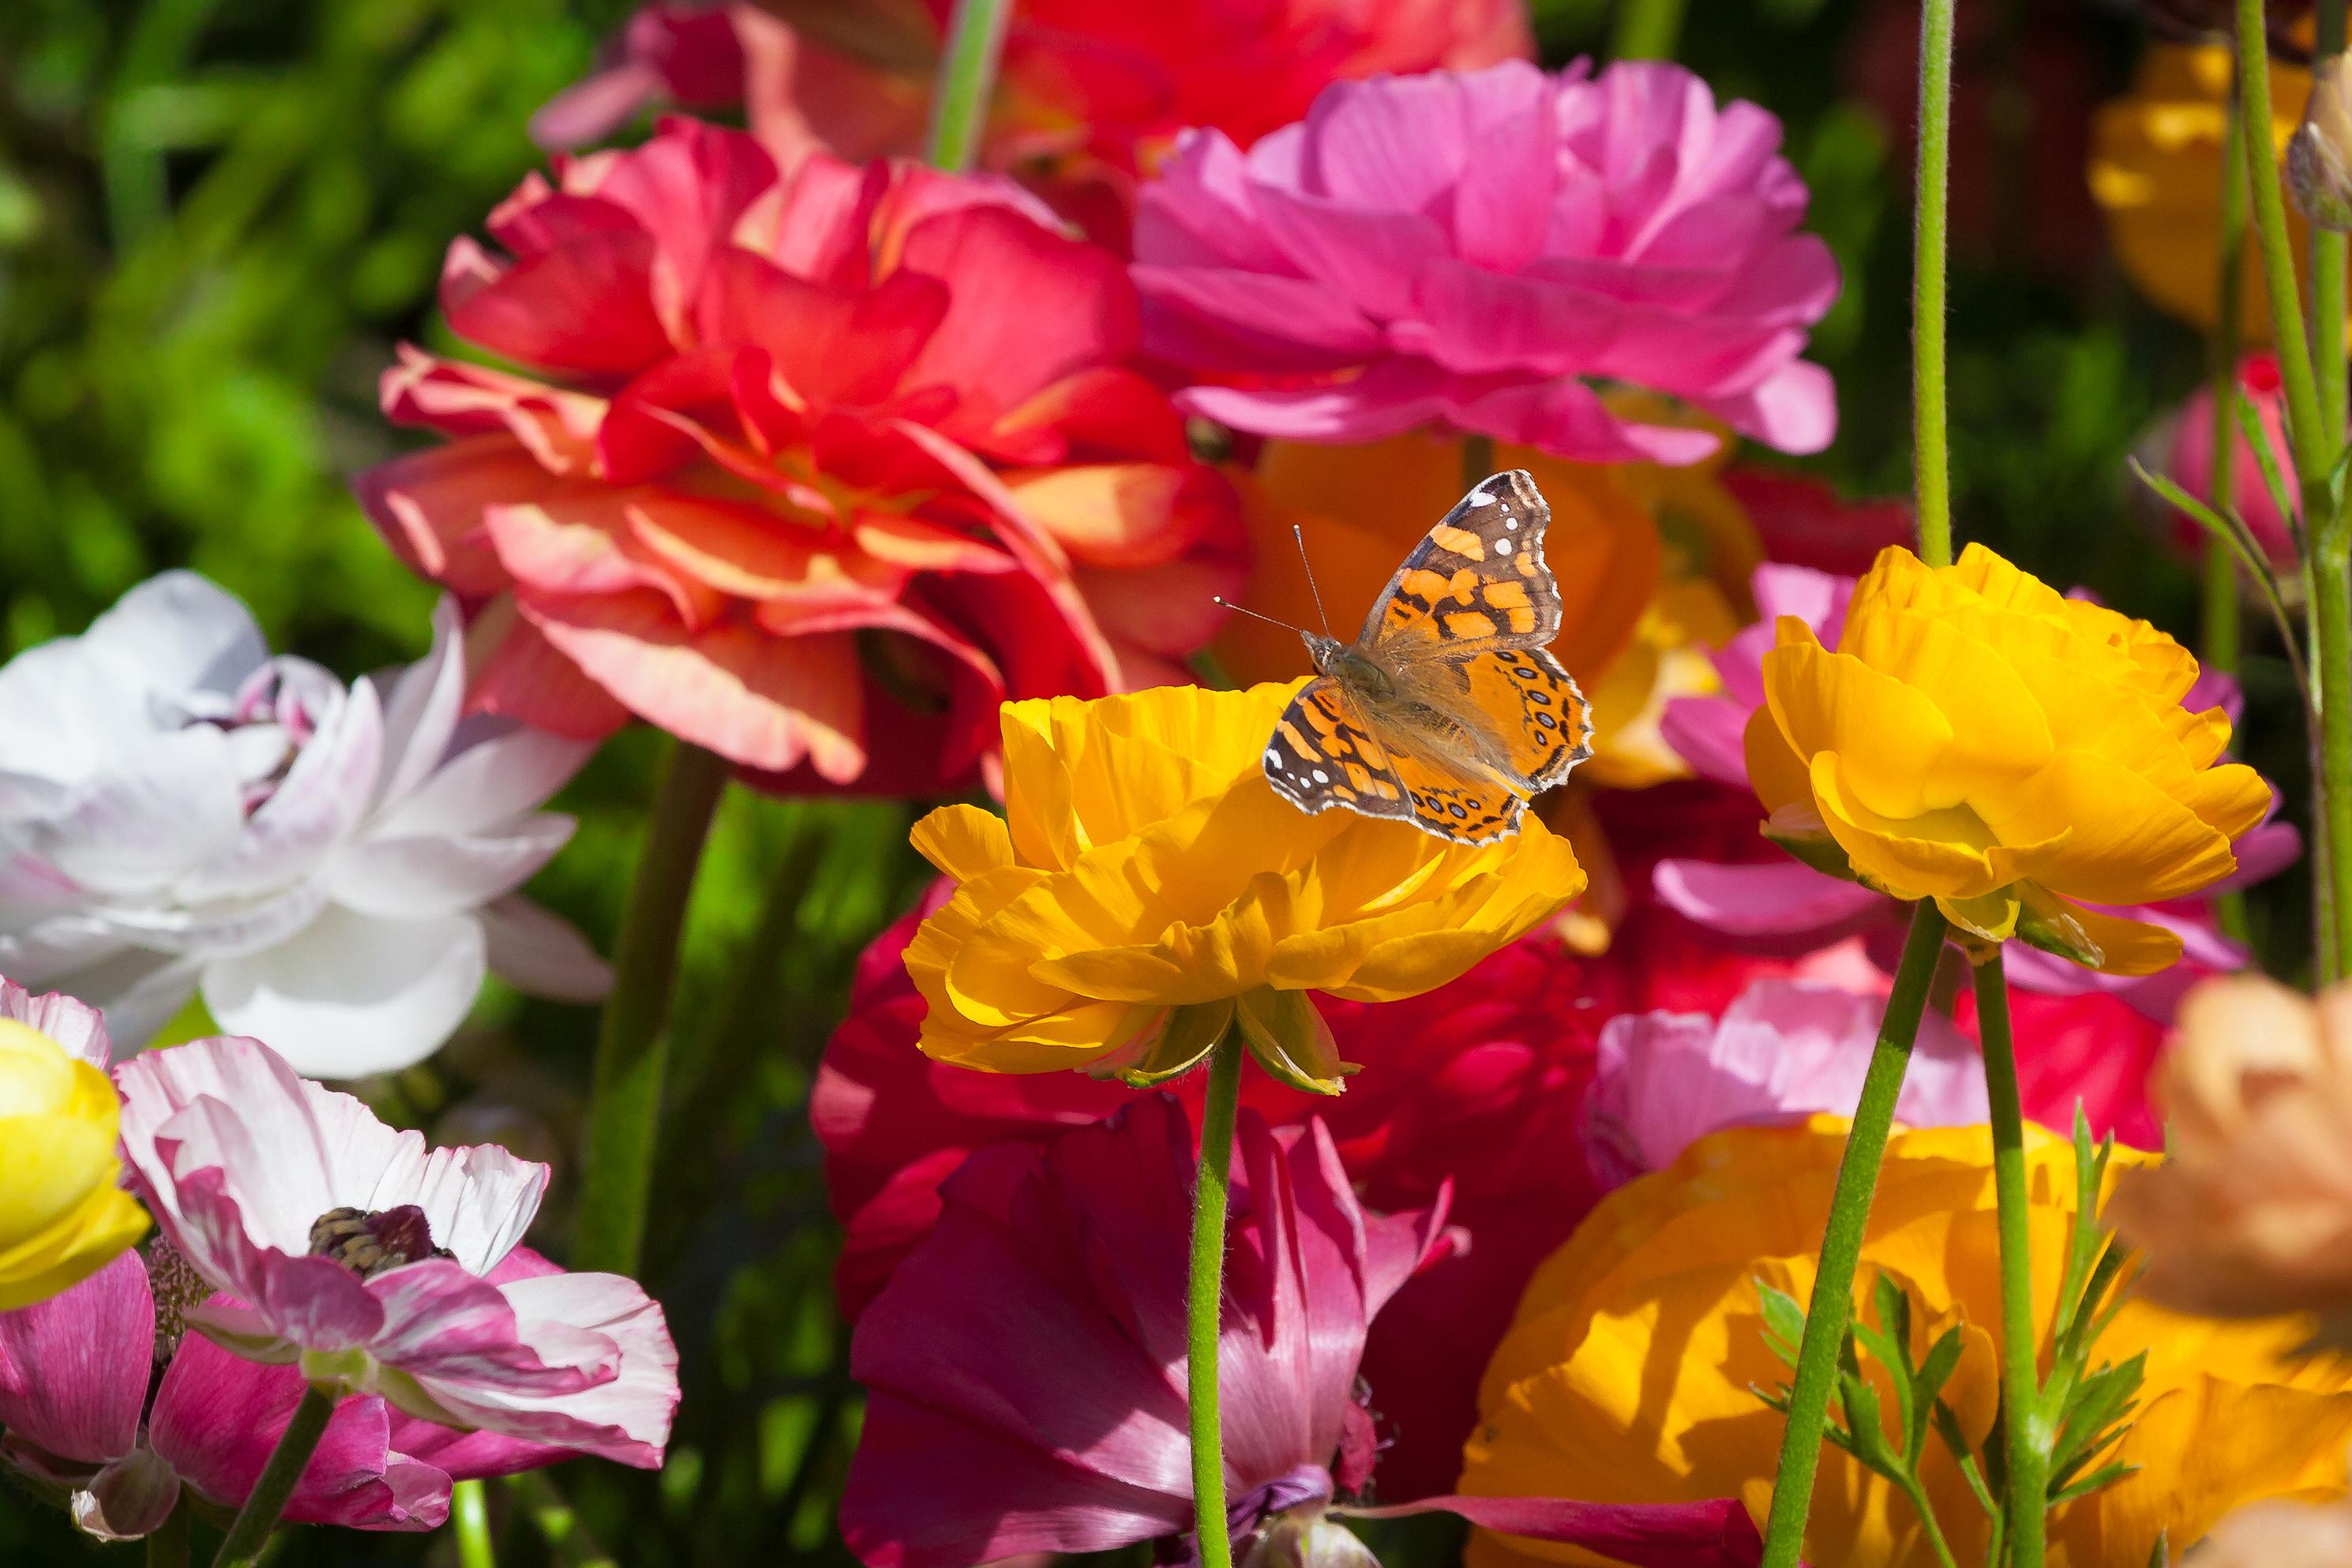 A butterfly lands on a yellow ranunculus flower.